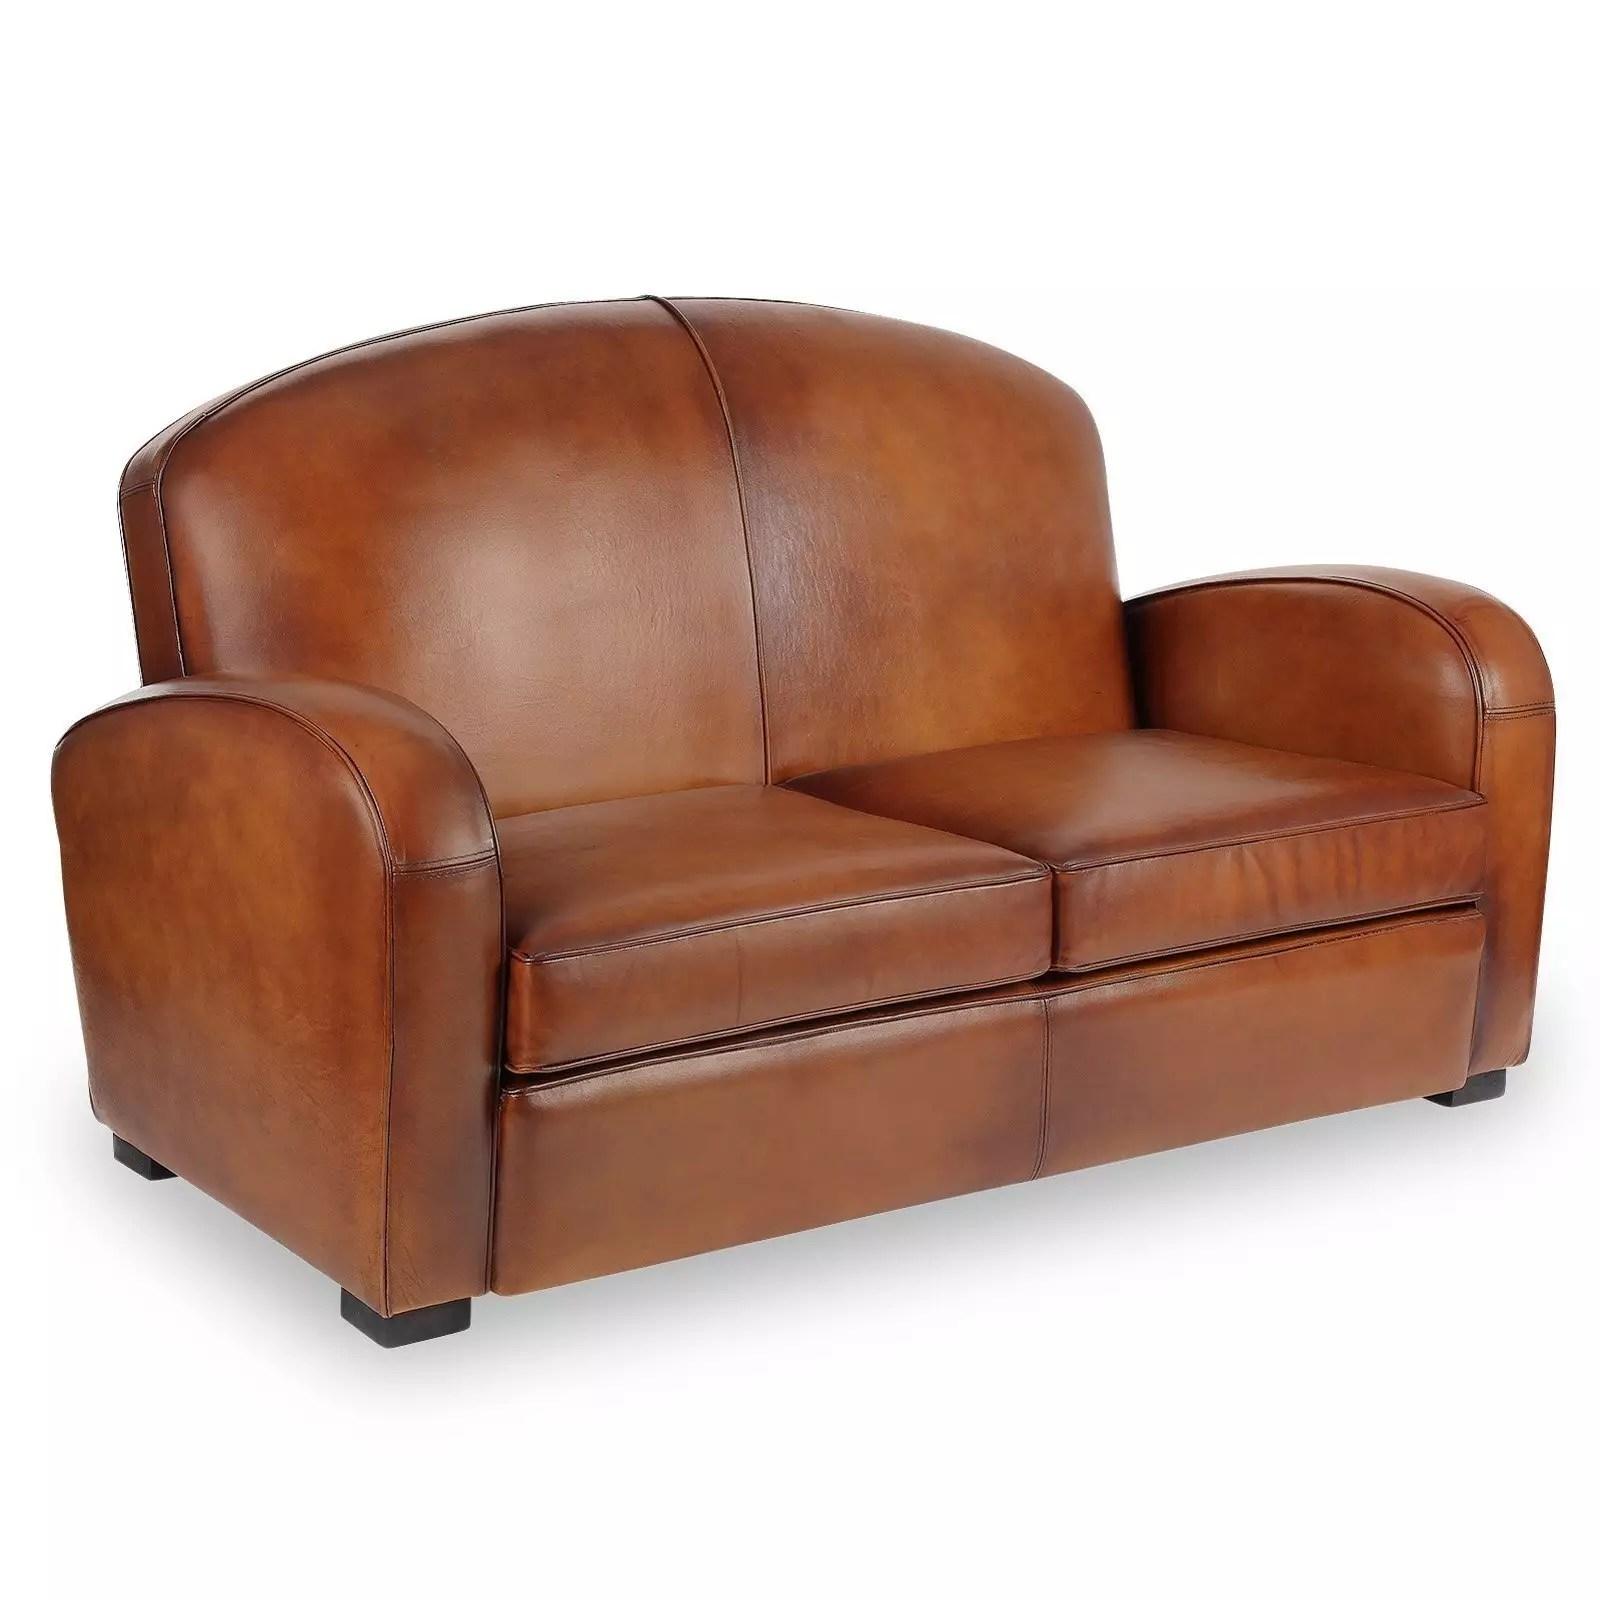 Jaca 2 seater sofa, simulated leather. Hemingway 2 seater Leather Club Sofa